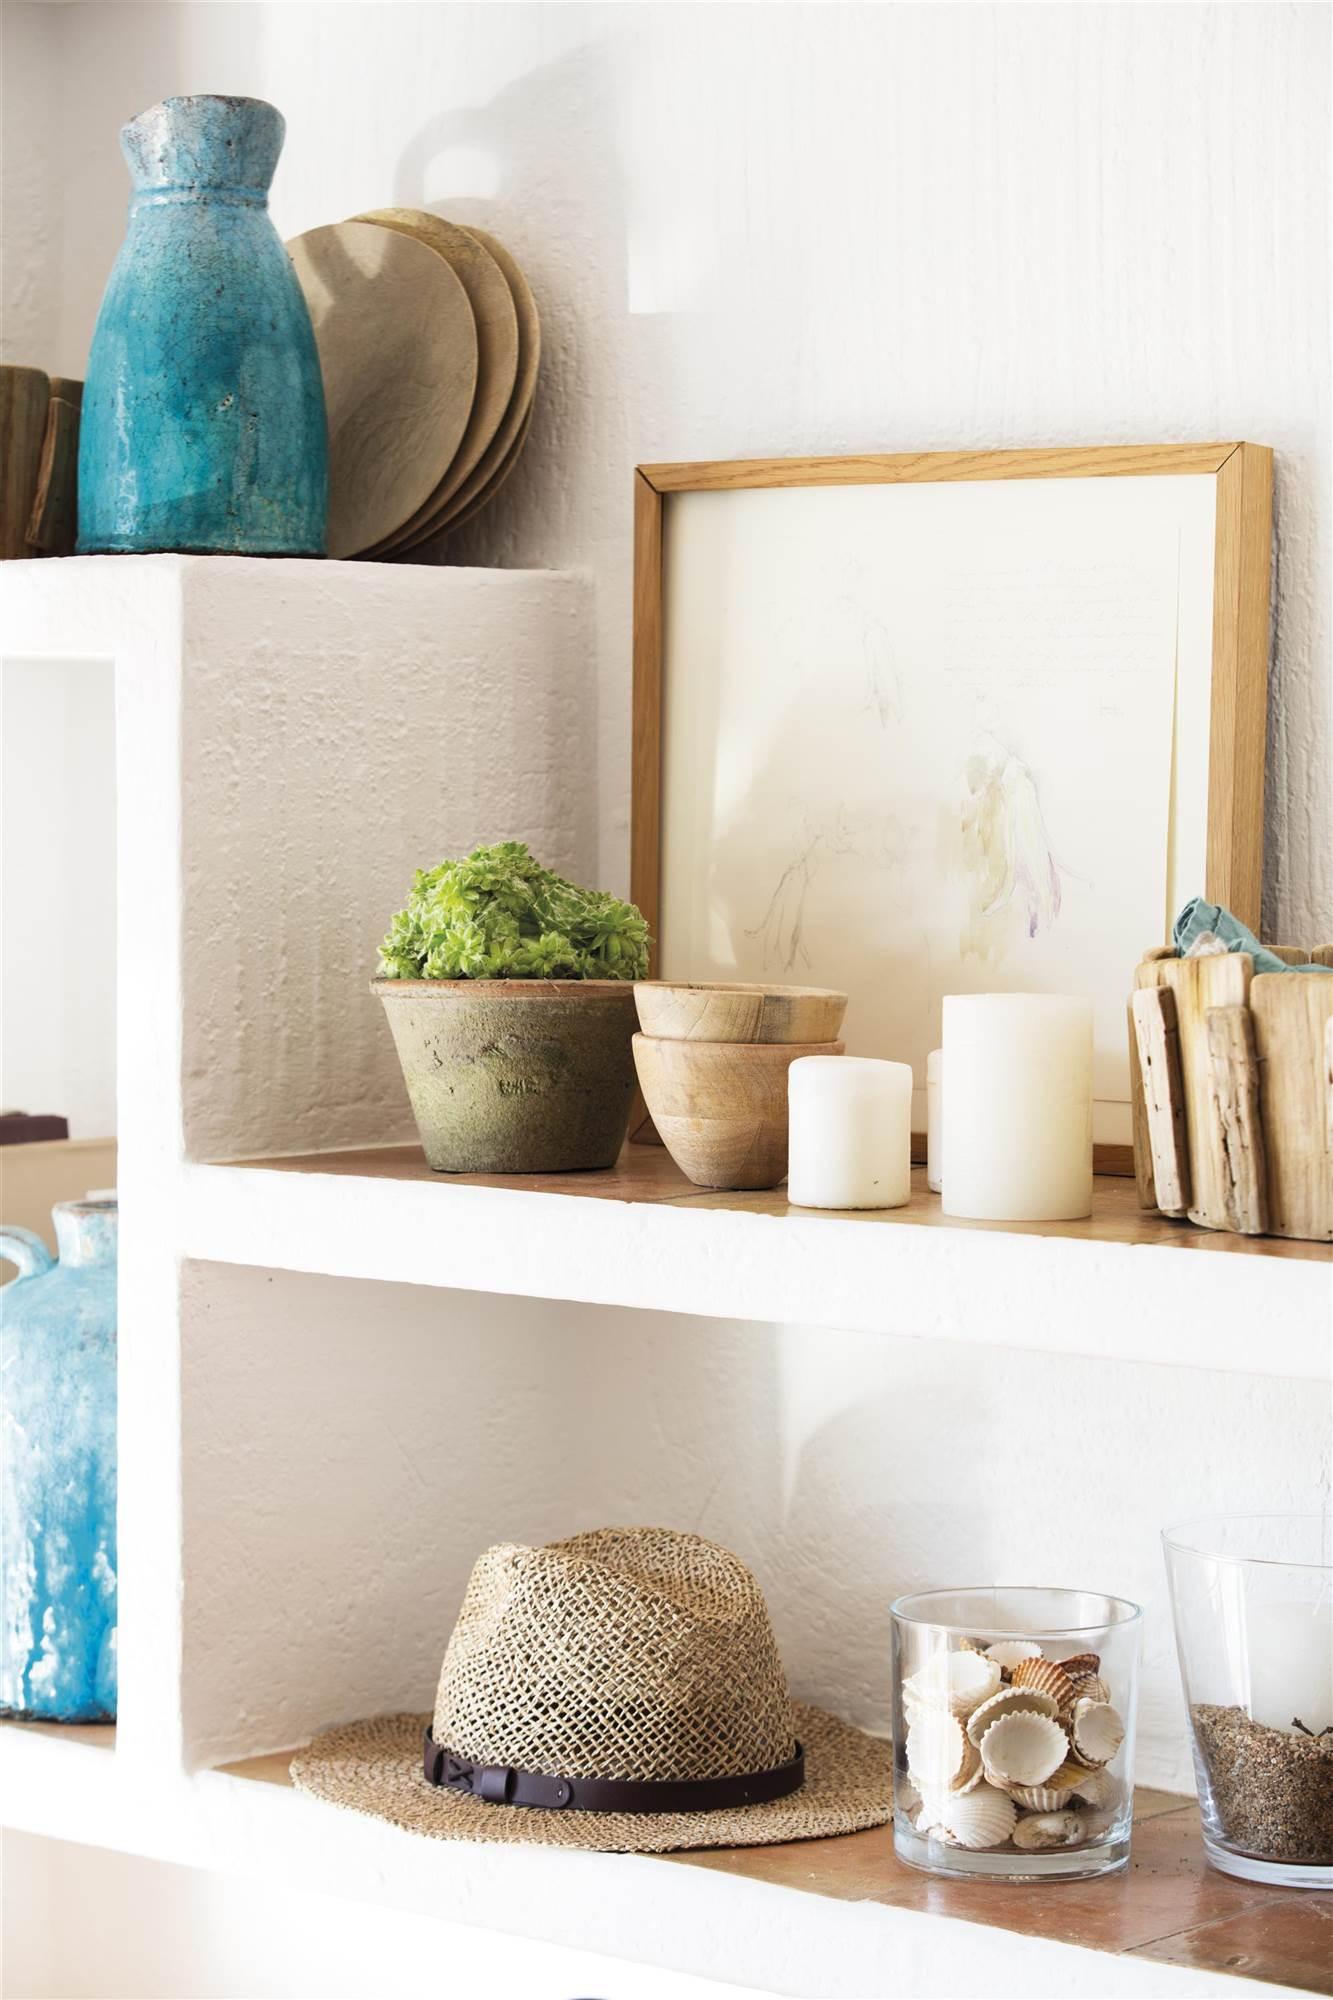 46 fotos de muebles de obra - Estanteria para plantas ...